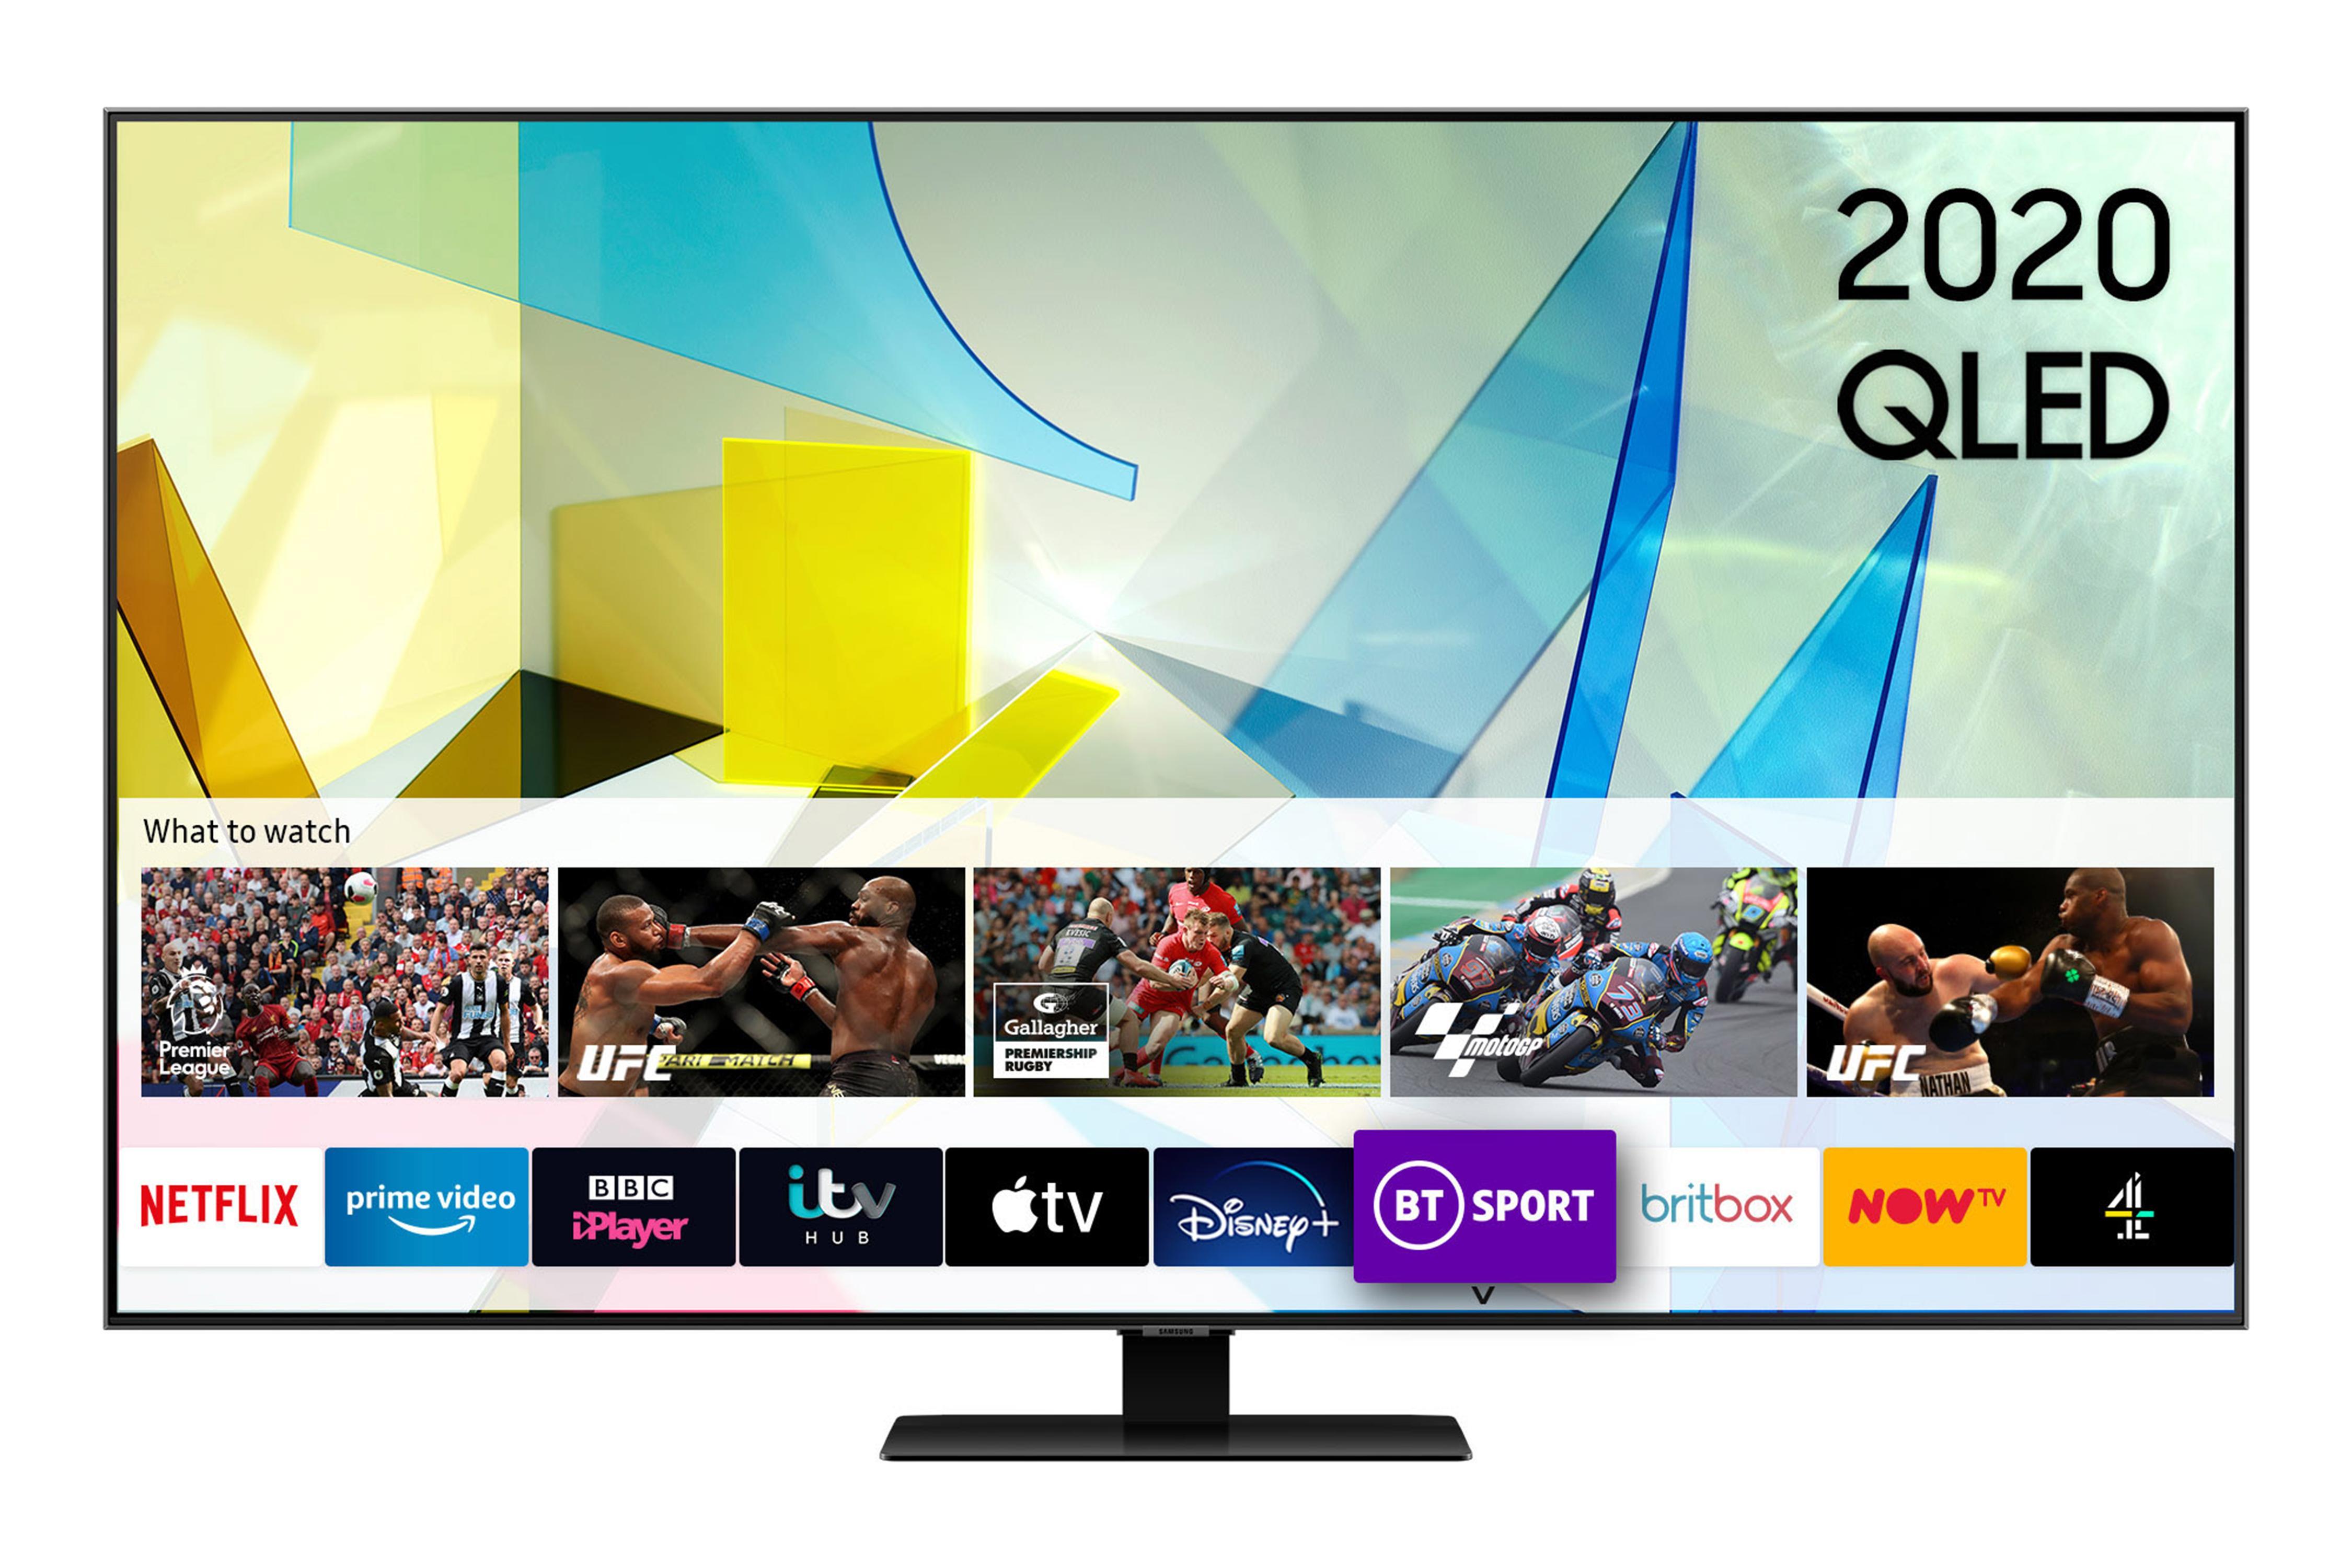 Samsung QE49Q80T (2020) 49 inch QLED 4K Smart TV incl 5yr warranty £799 @ Simply Electricals